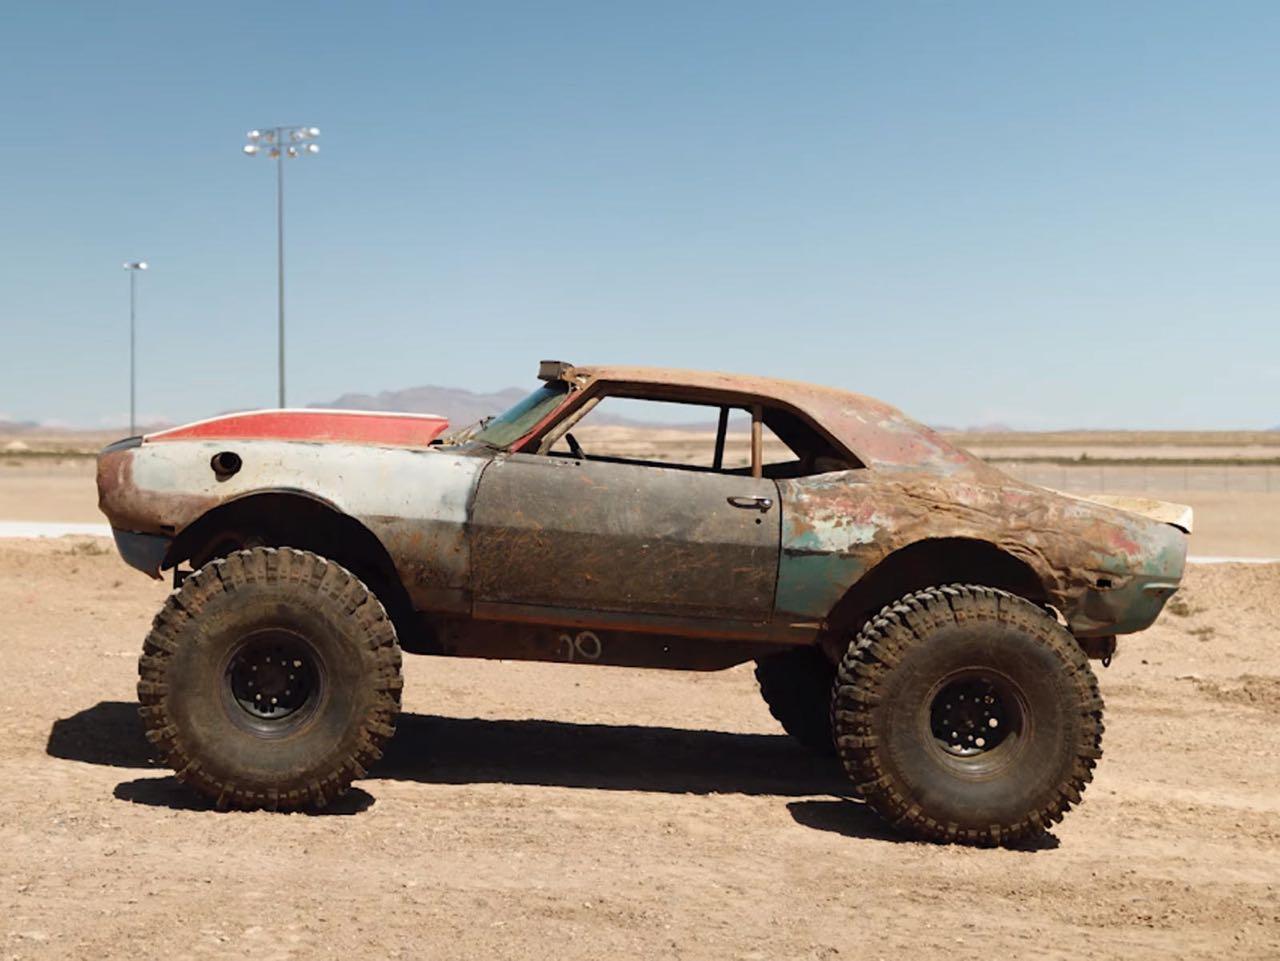 The Mudmaro : La fusion d'un Hummer H1 et d'une Camaro ! 4